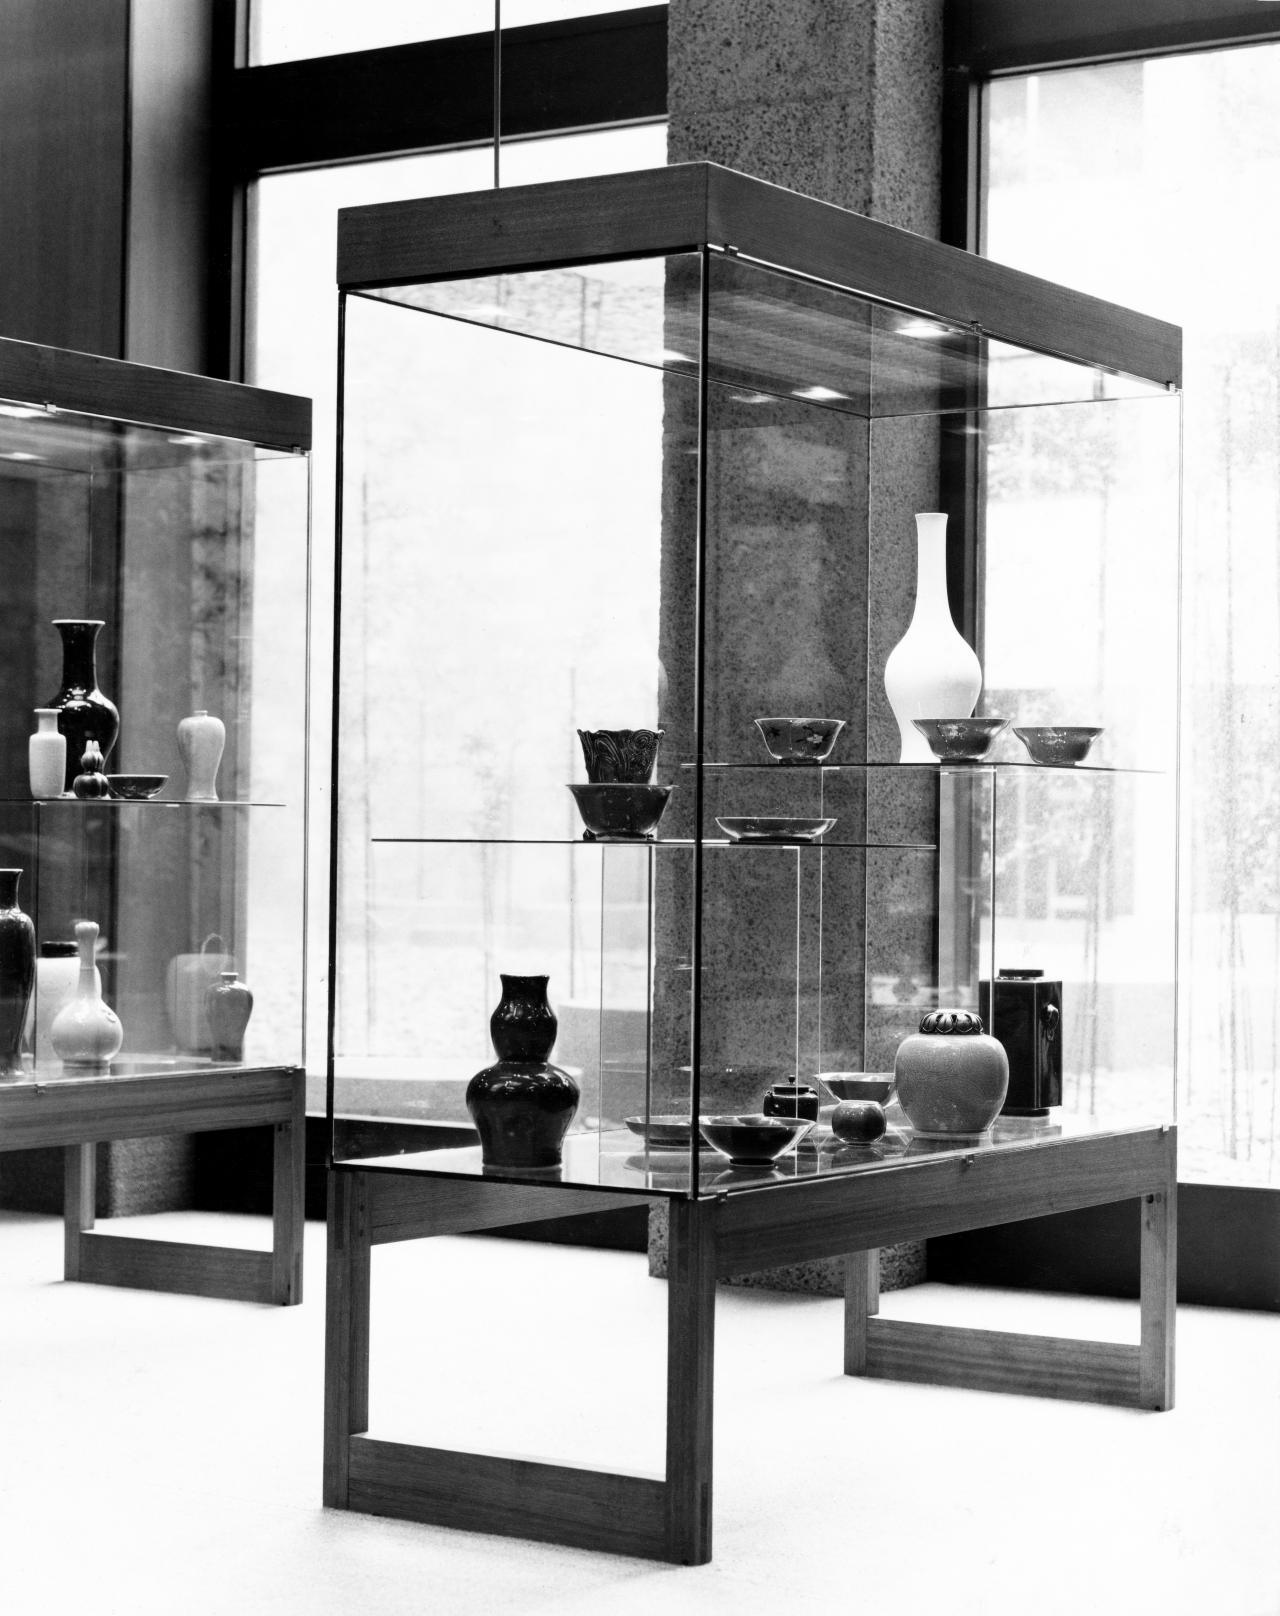 1 Display Cases, Internal Lighting And Display Furnishings, Oriental Gallery,  NGV Home Design Ideas